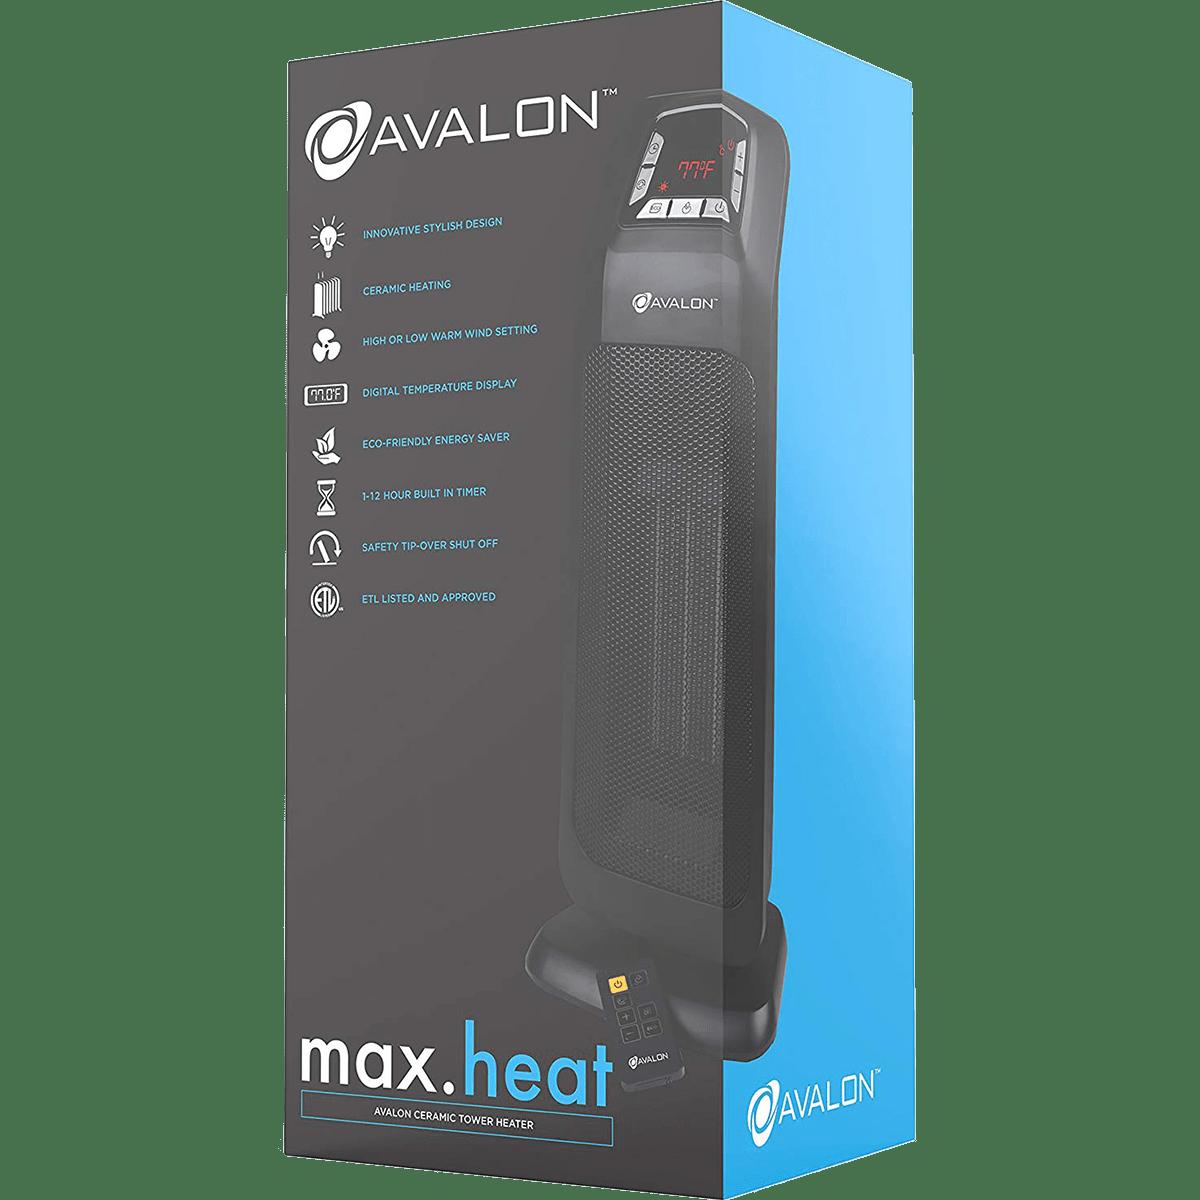 Avalon Oscillating 20 Inch Tower Heater Sylvane